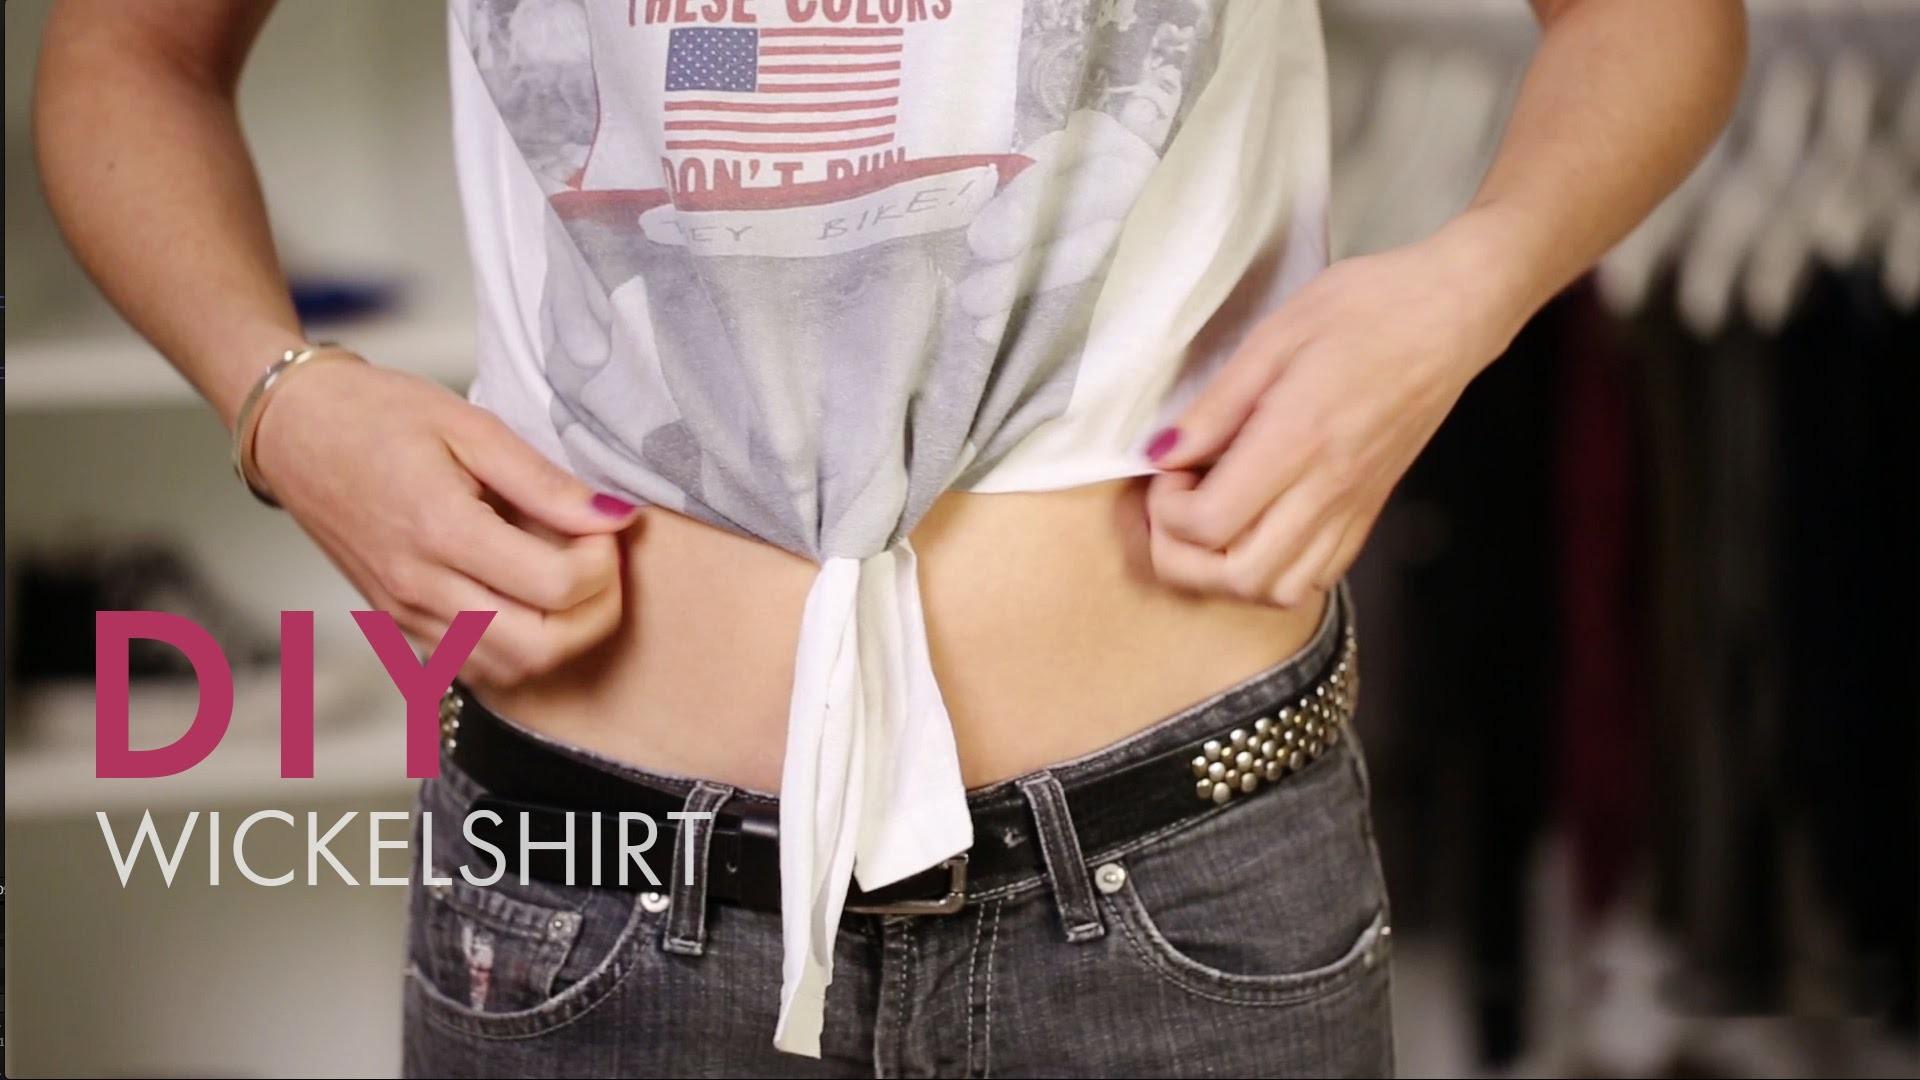 DIY Wickelshirt » Do it Yourself Tutorial | STYLIGHT How To Wear